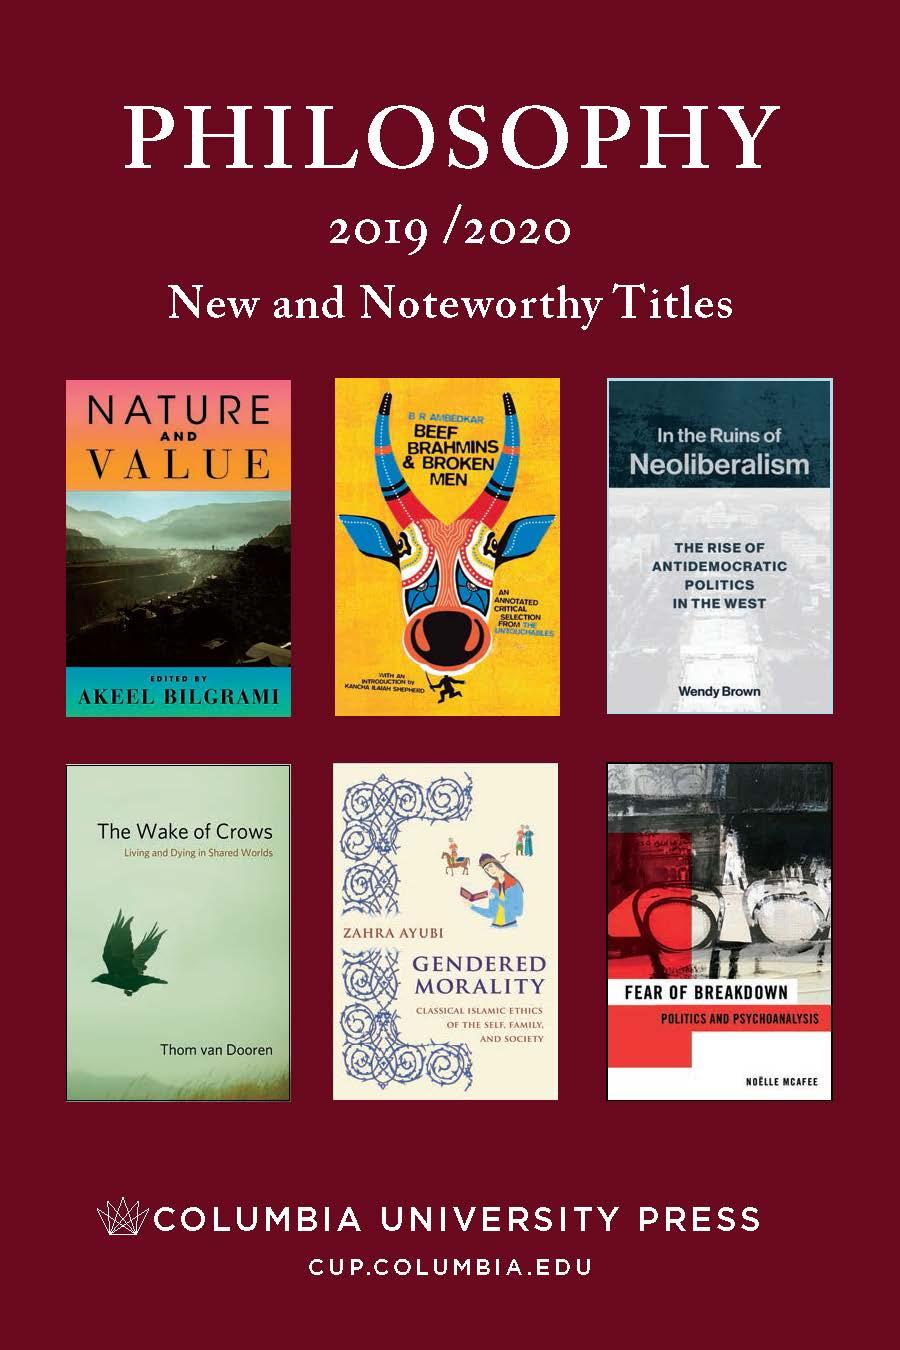 2019/2020 Philosophy Catalog